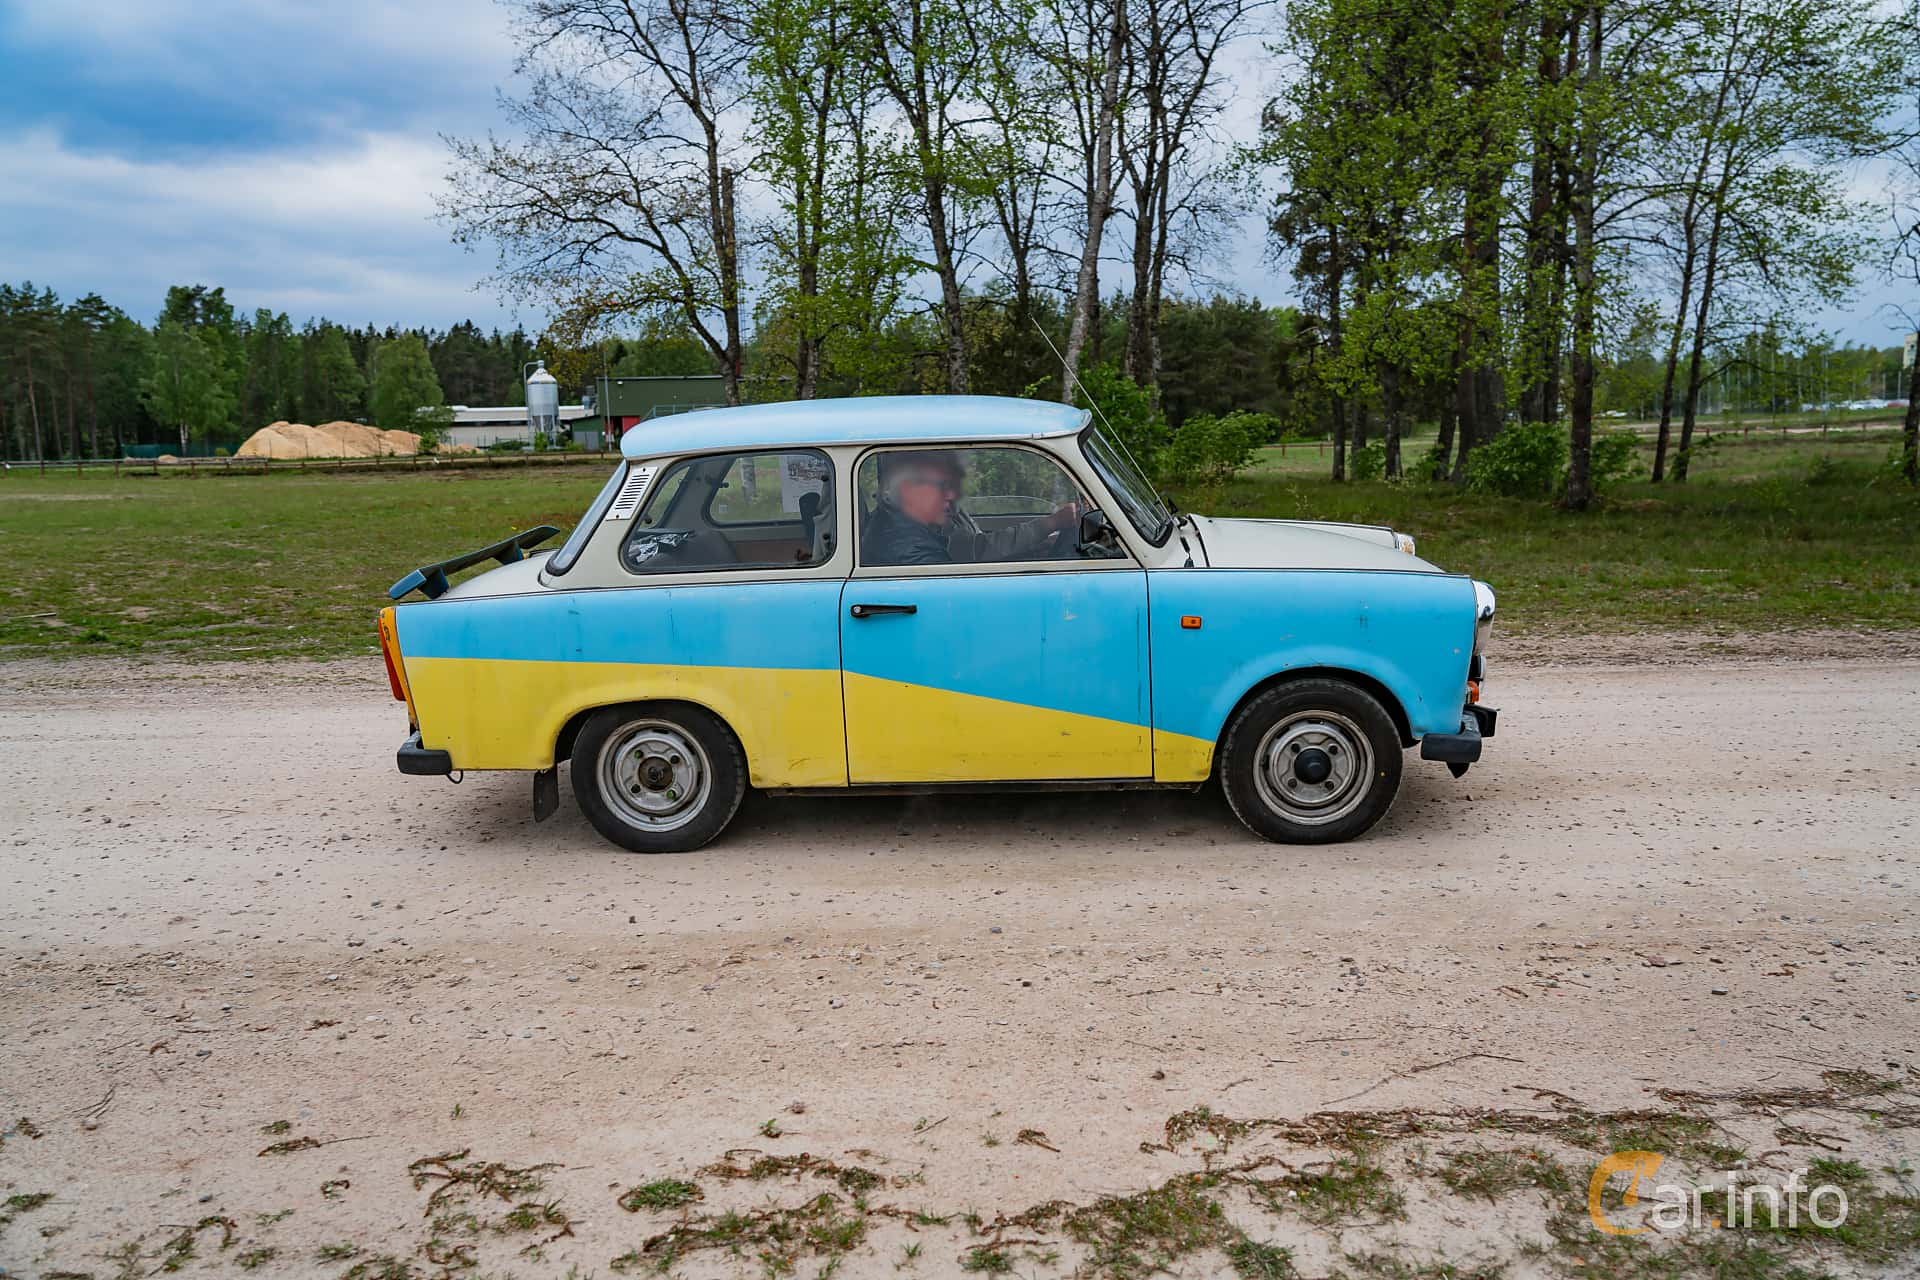 Trabant 601 Limousine 0.6 Manual, 26hp, 1987 at Riksettanrallyt 2019 Skillingaryd